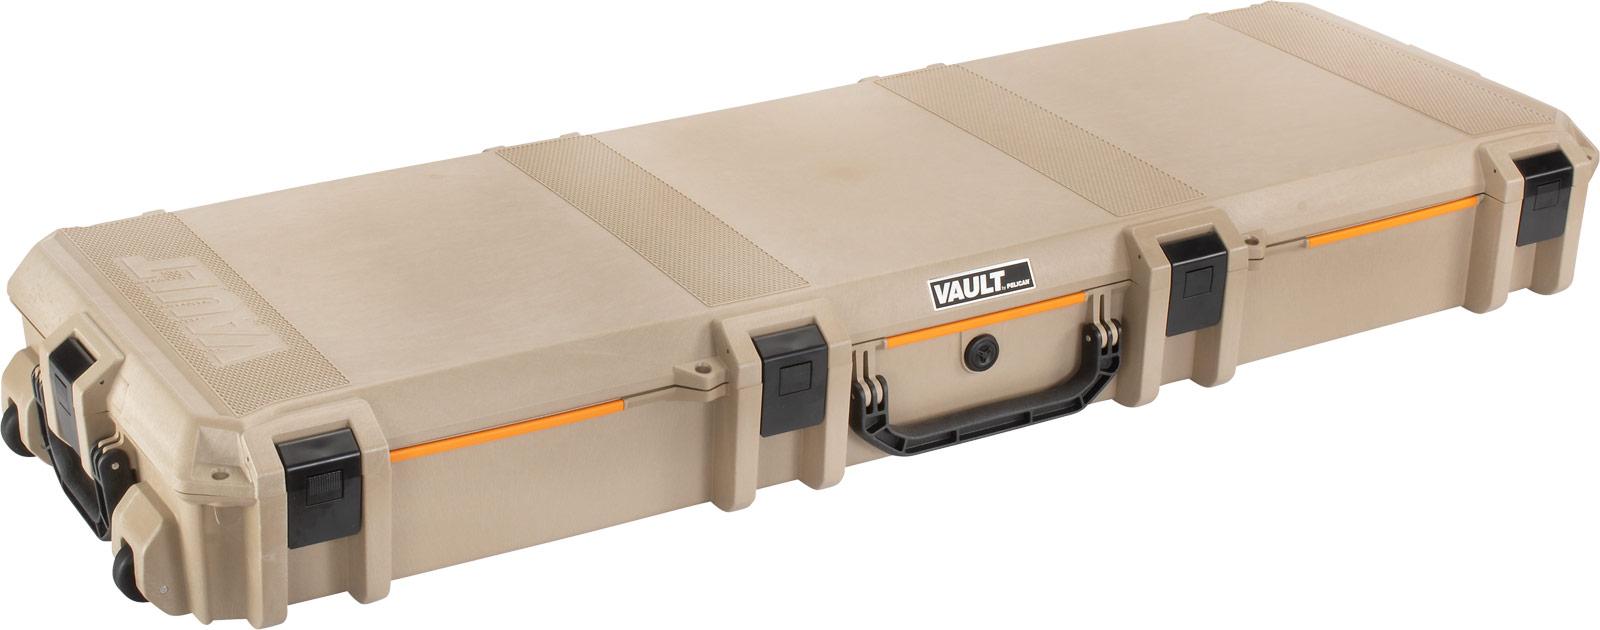 pelican vault v800 scope rifle case